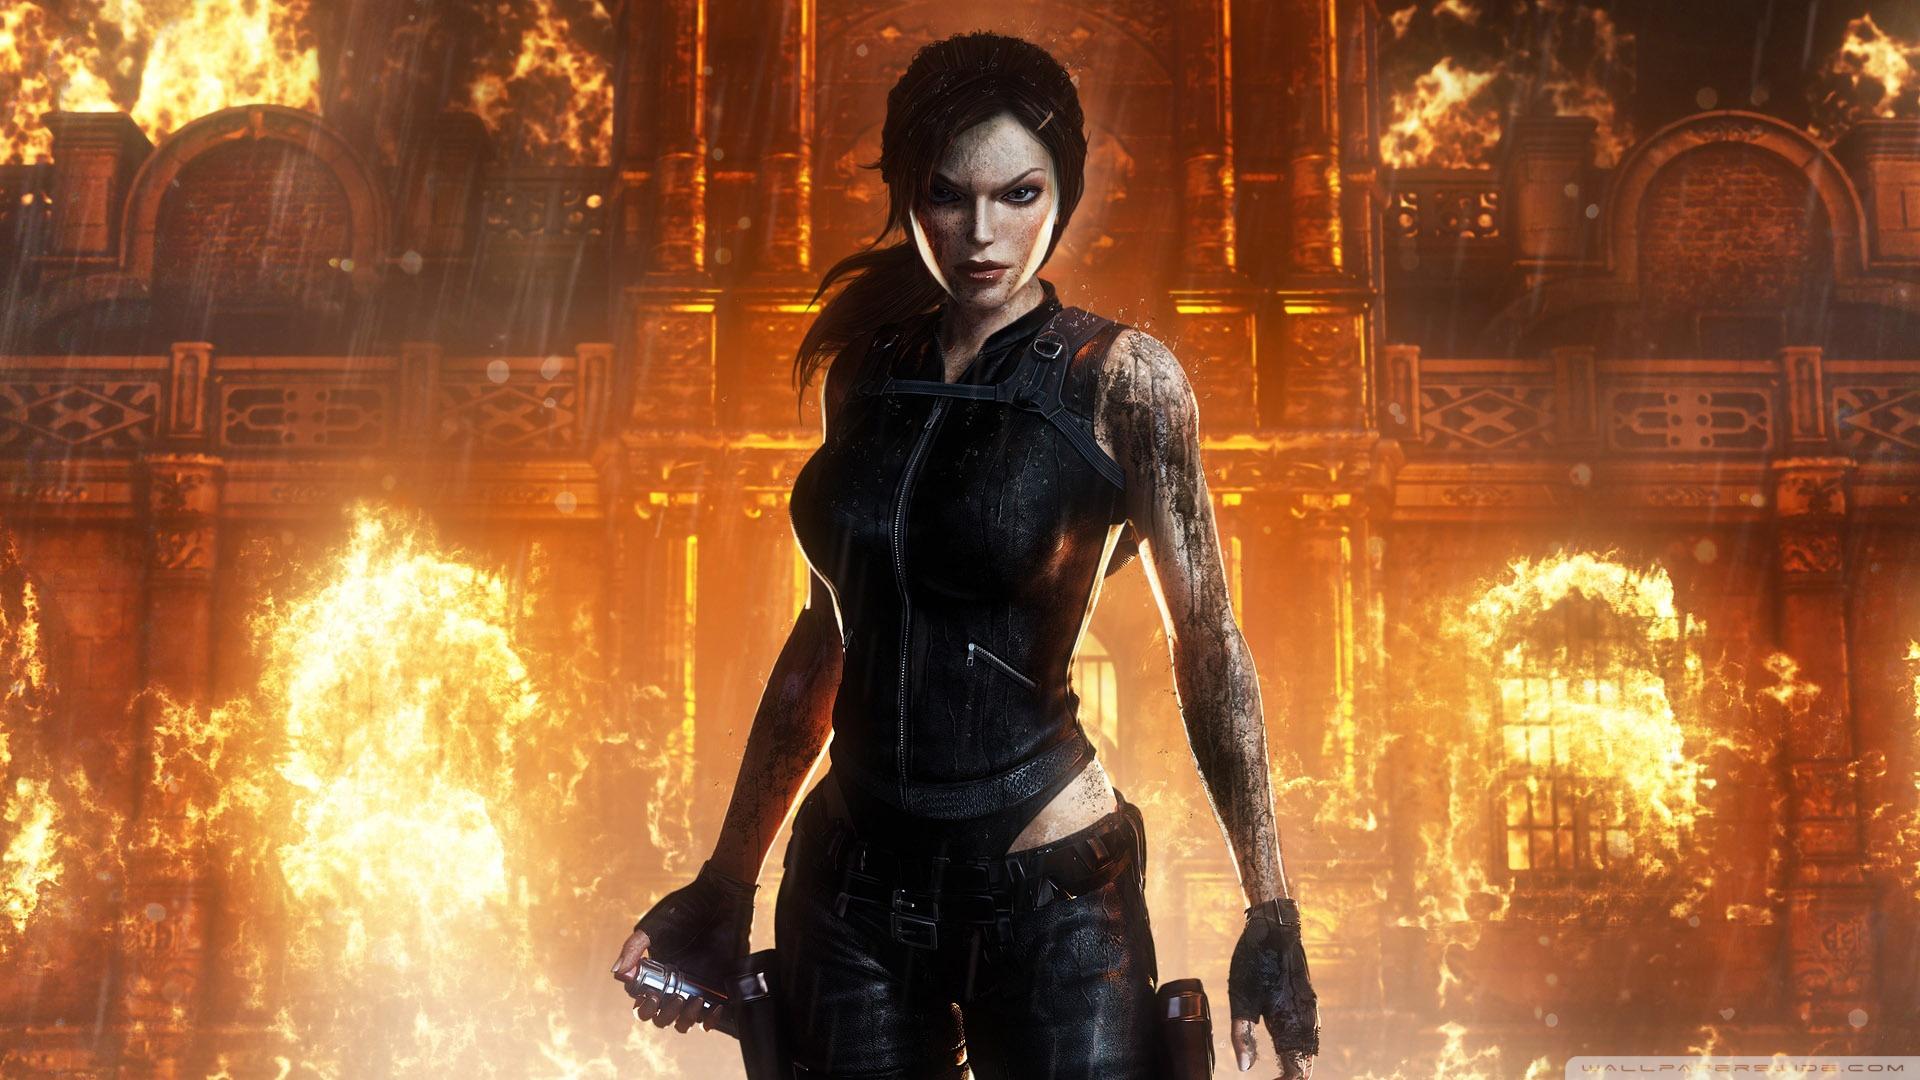 Tomb Raider Underworld 7 Wallpaper 1920x1080 Tomb Raider Underworld 1920x1080